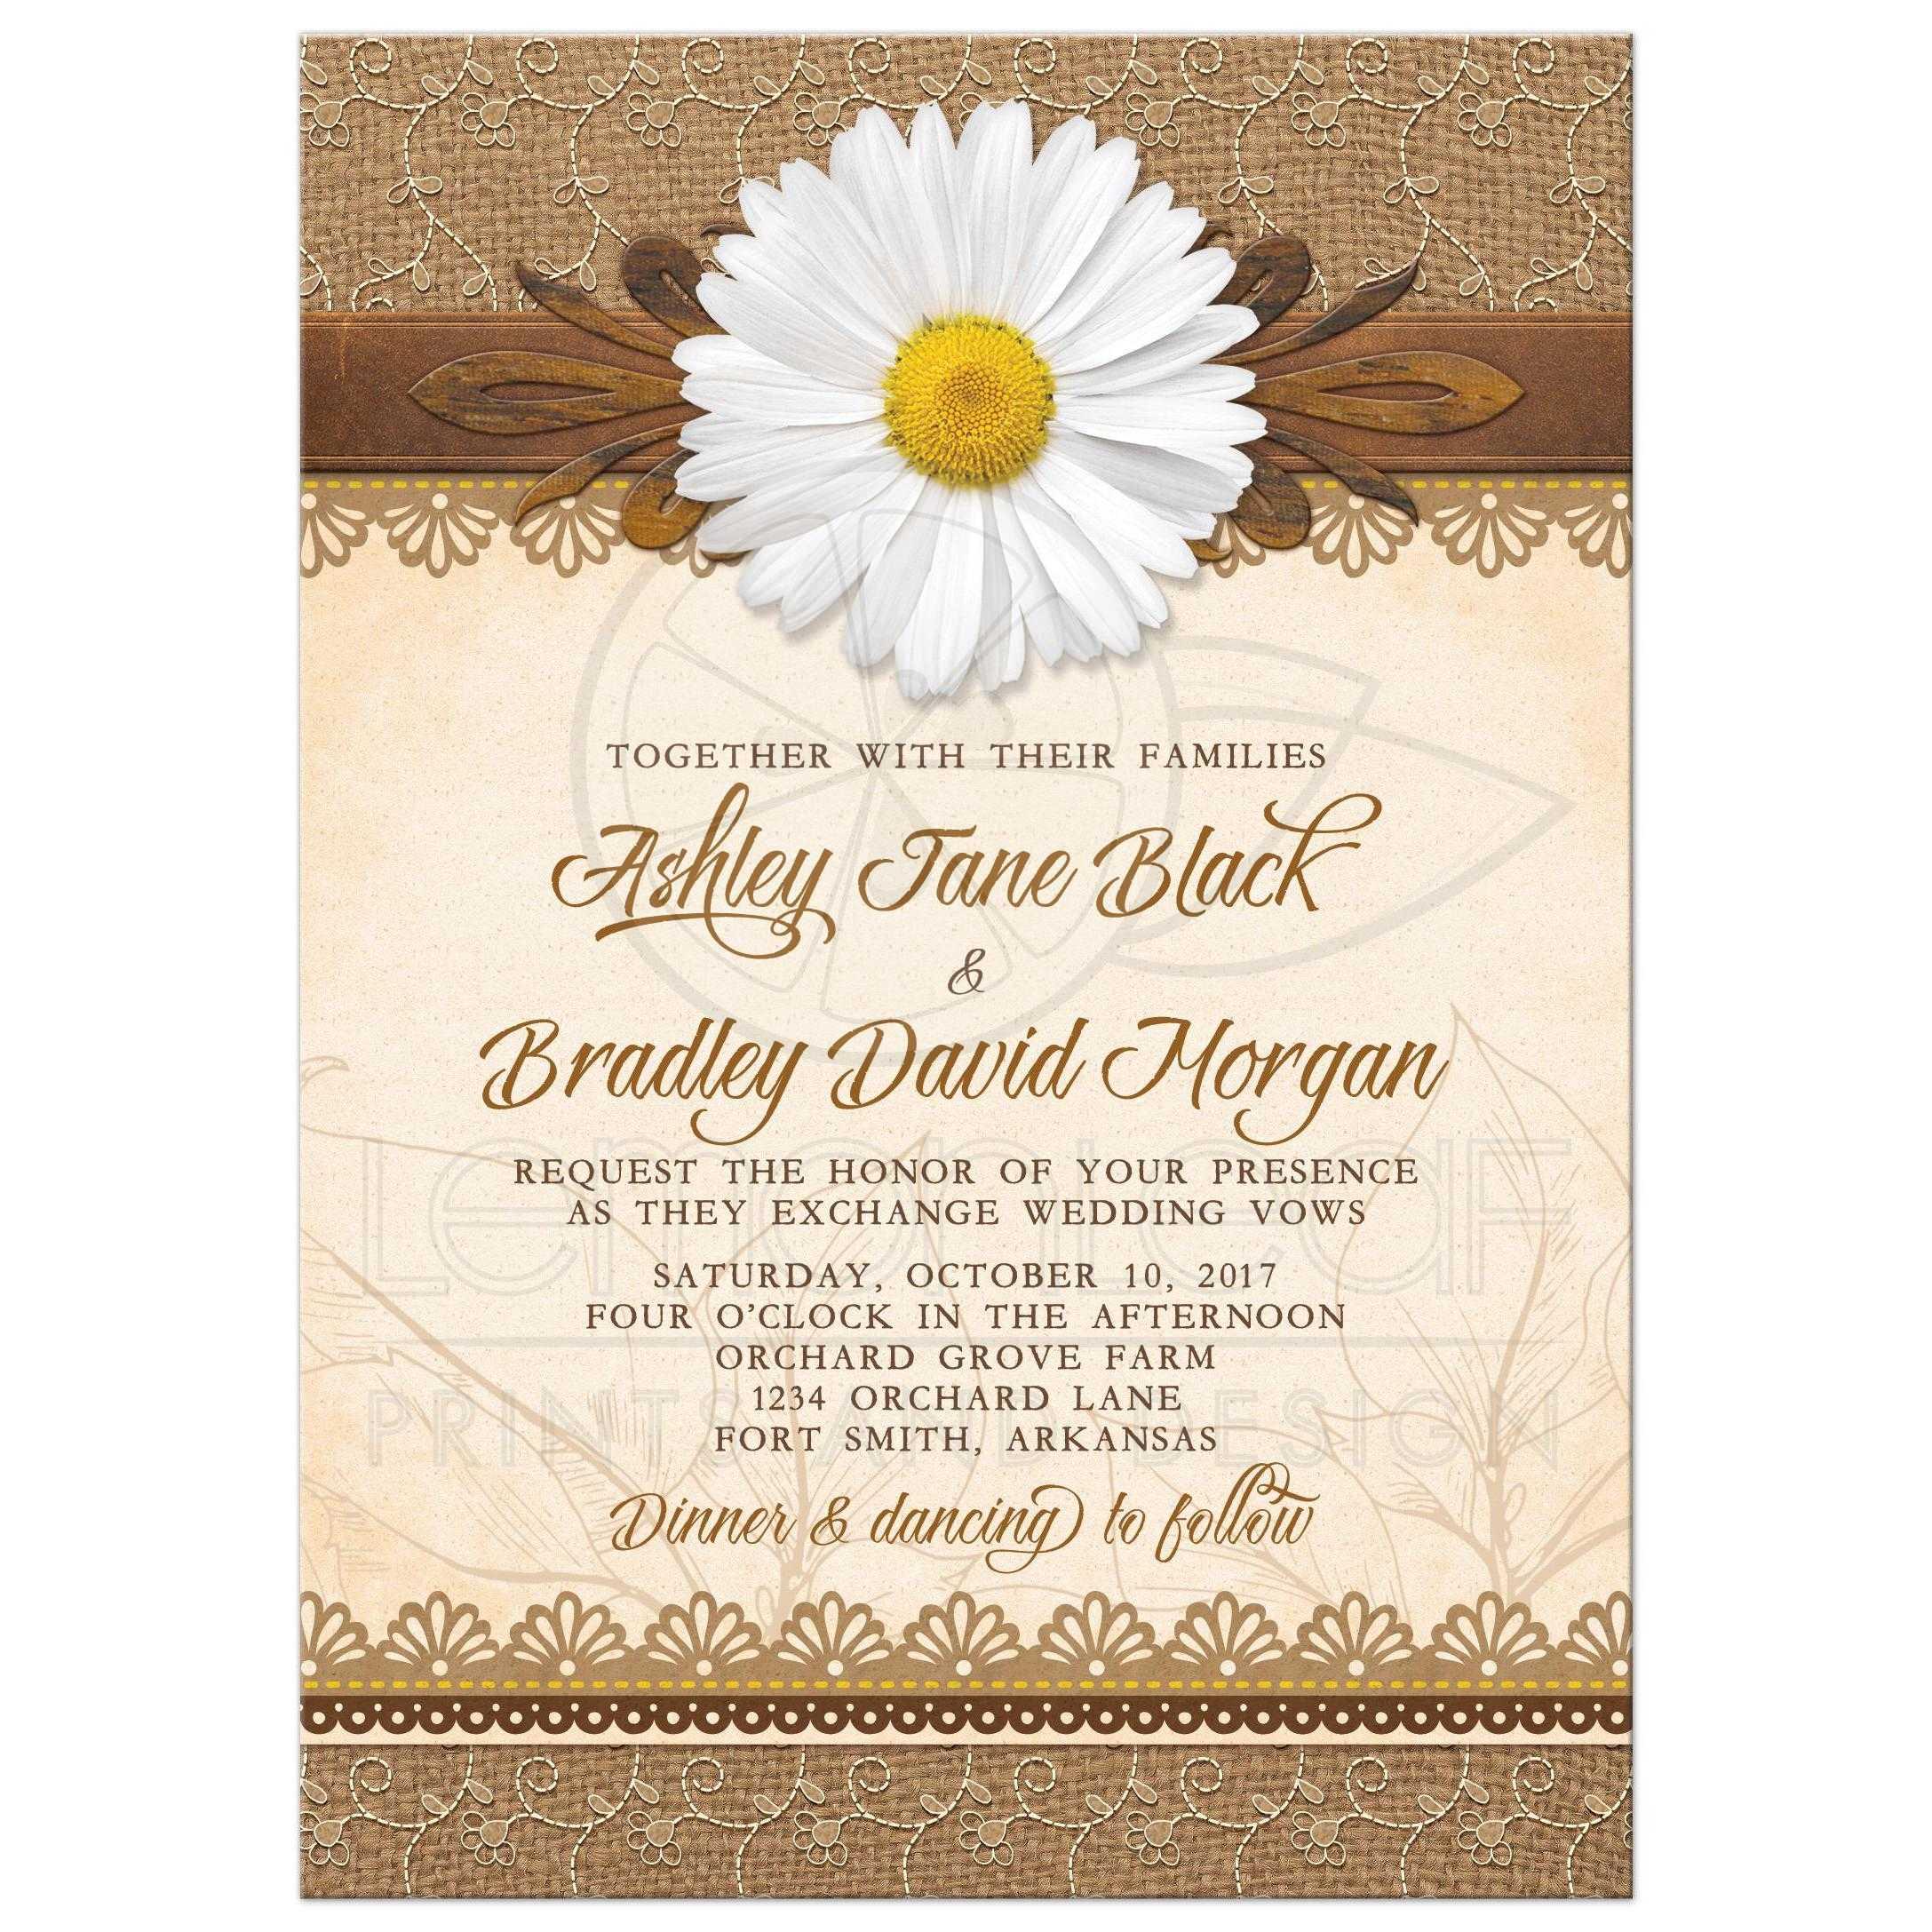 Rustic Daisy Wedding Invitation Burlap Lace Wood